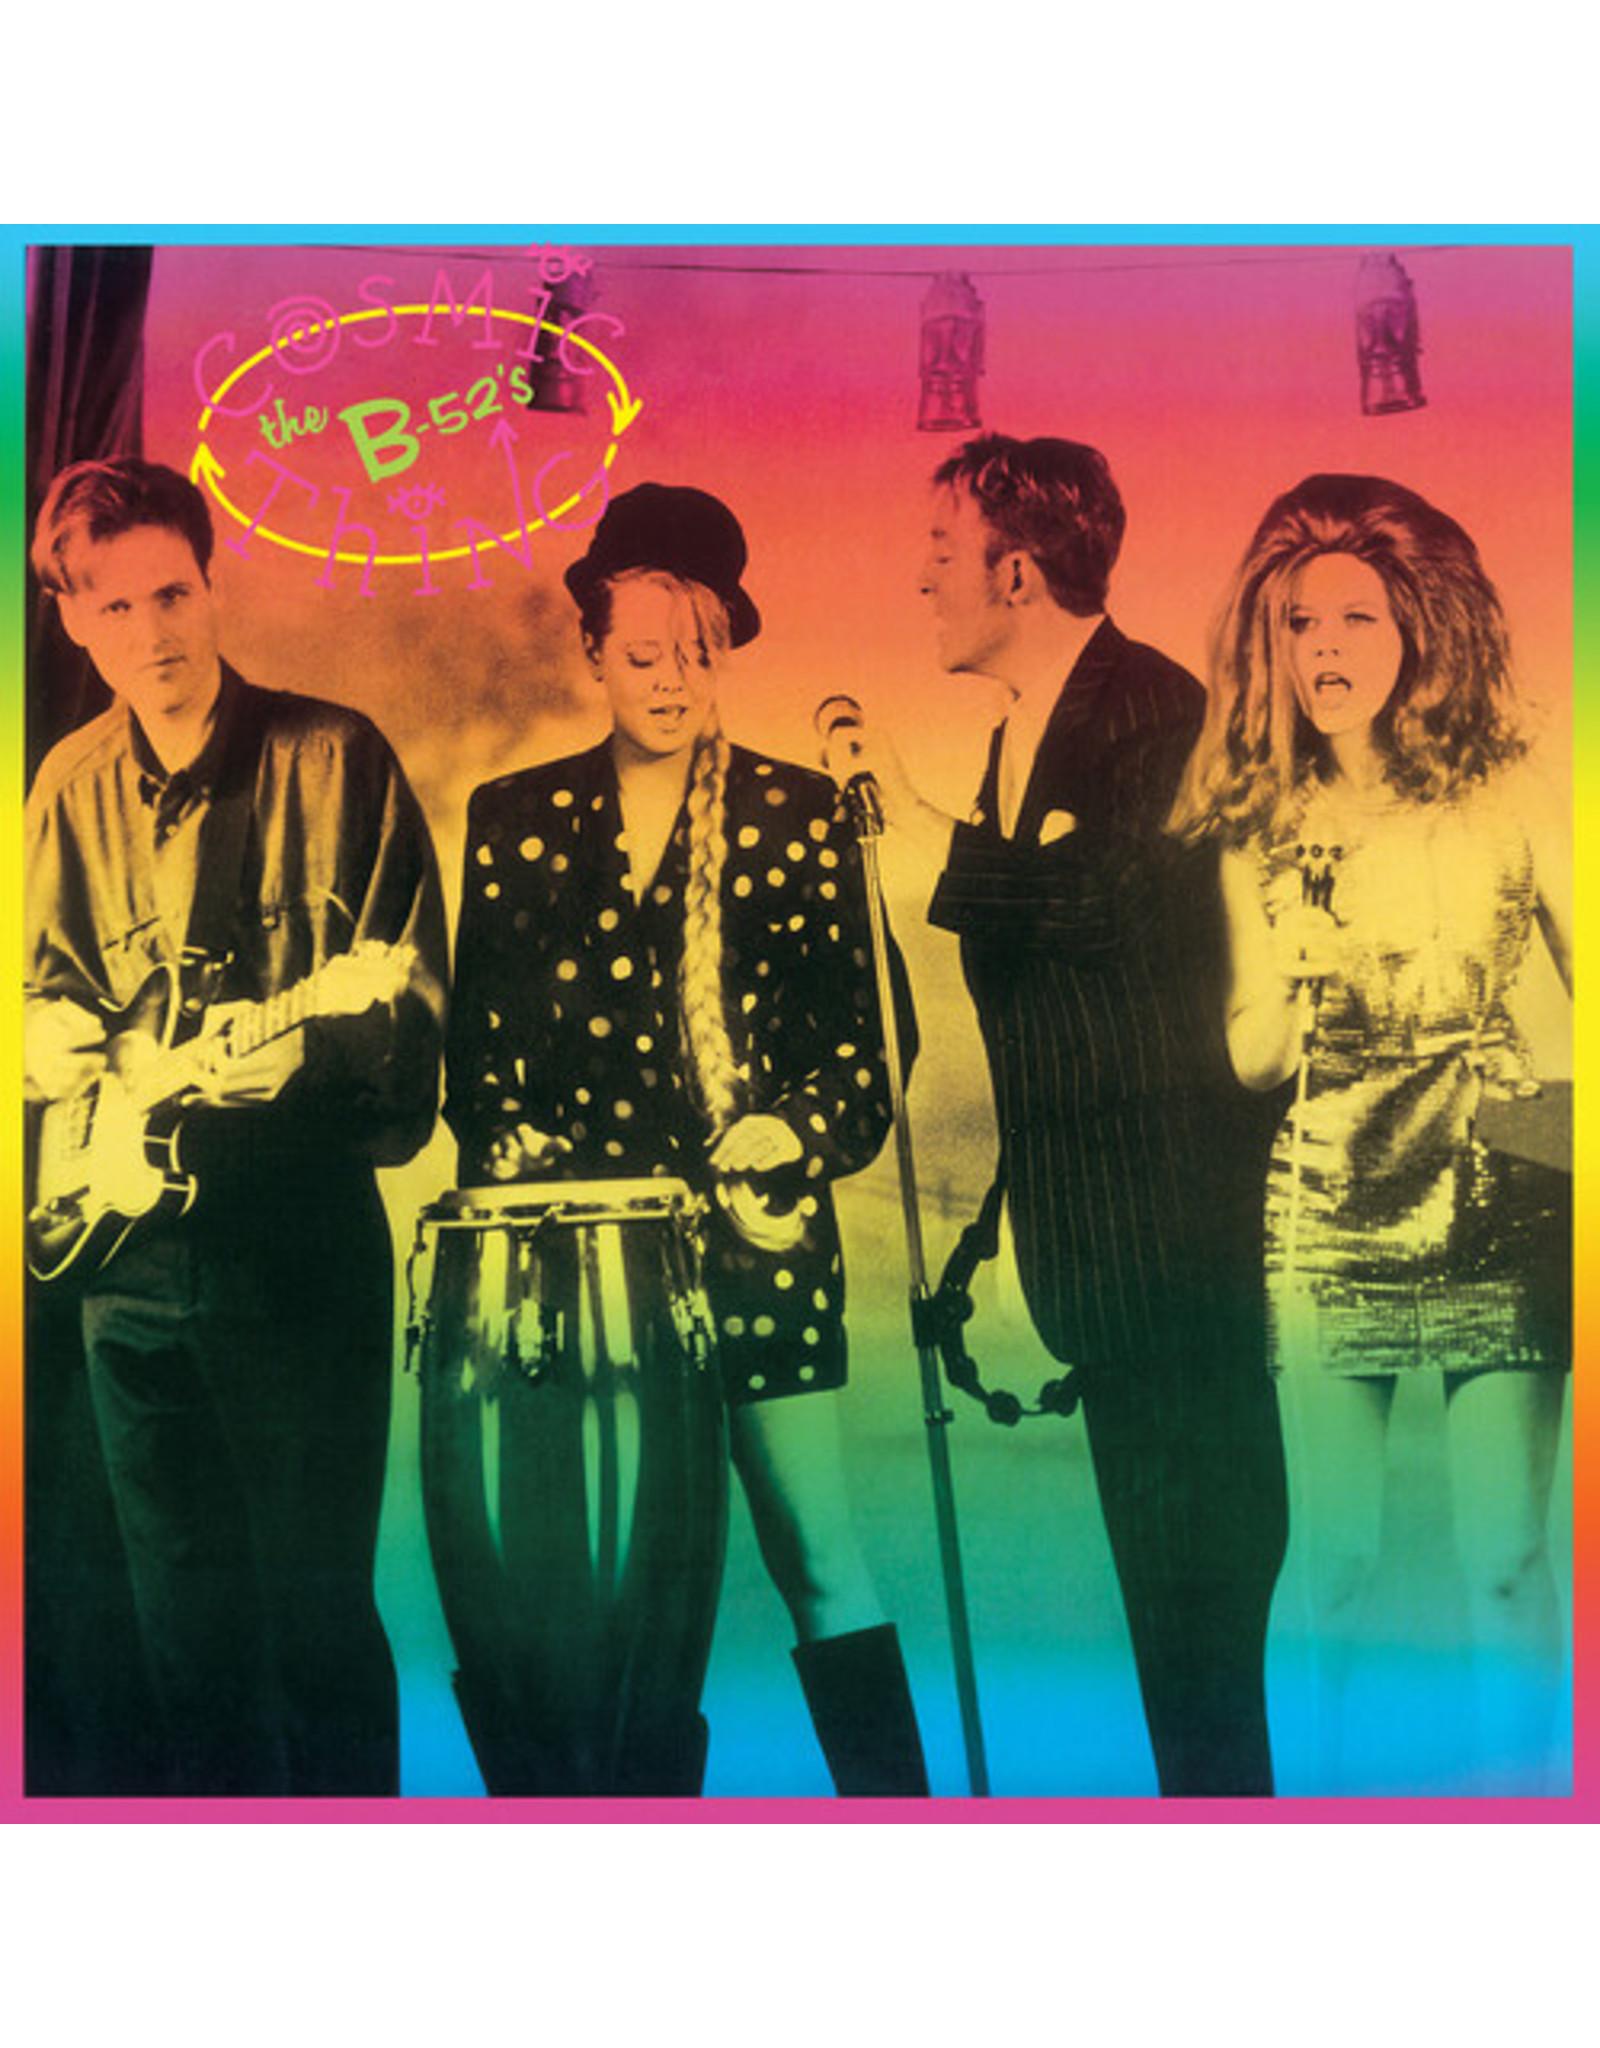 New Vinyl B-52's - Cosmic Thing LP